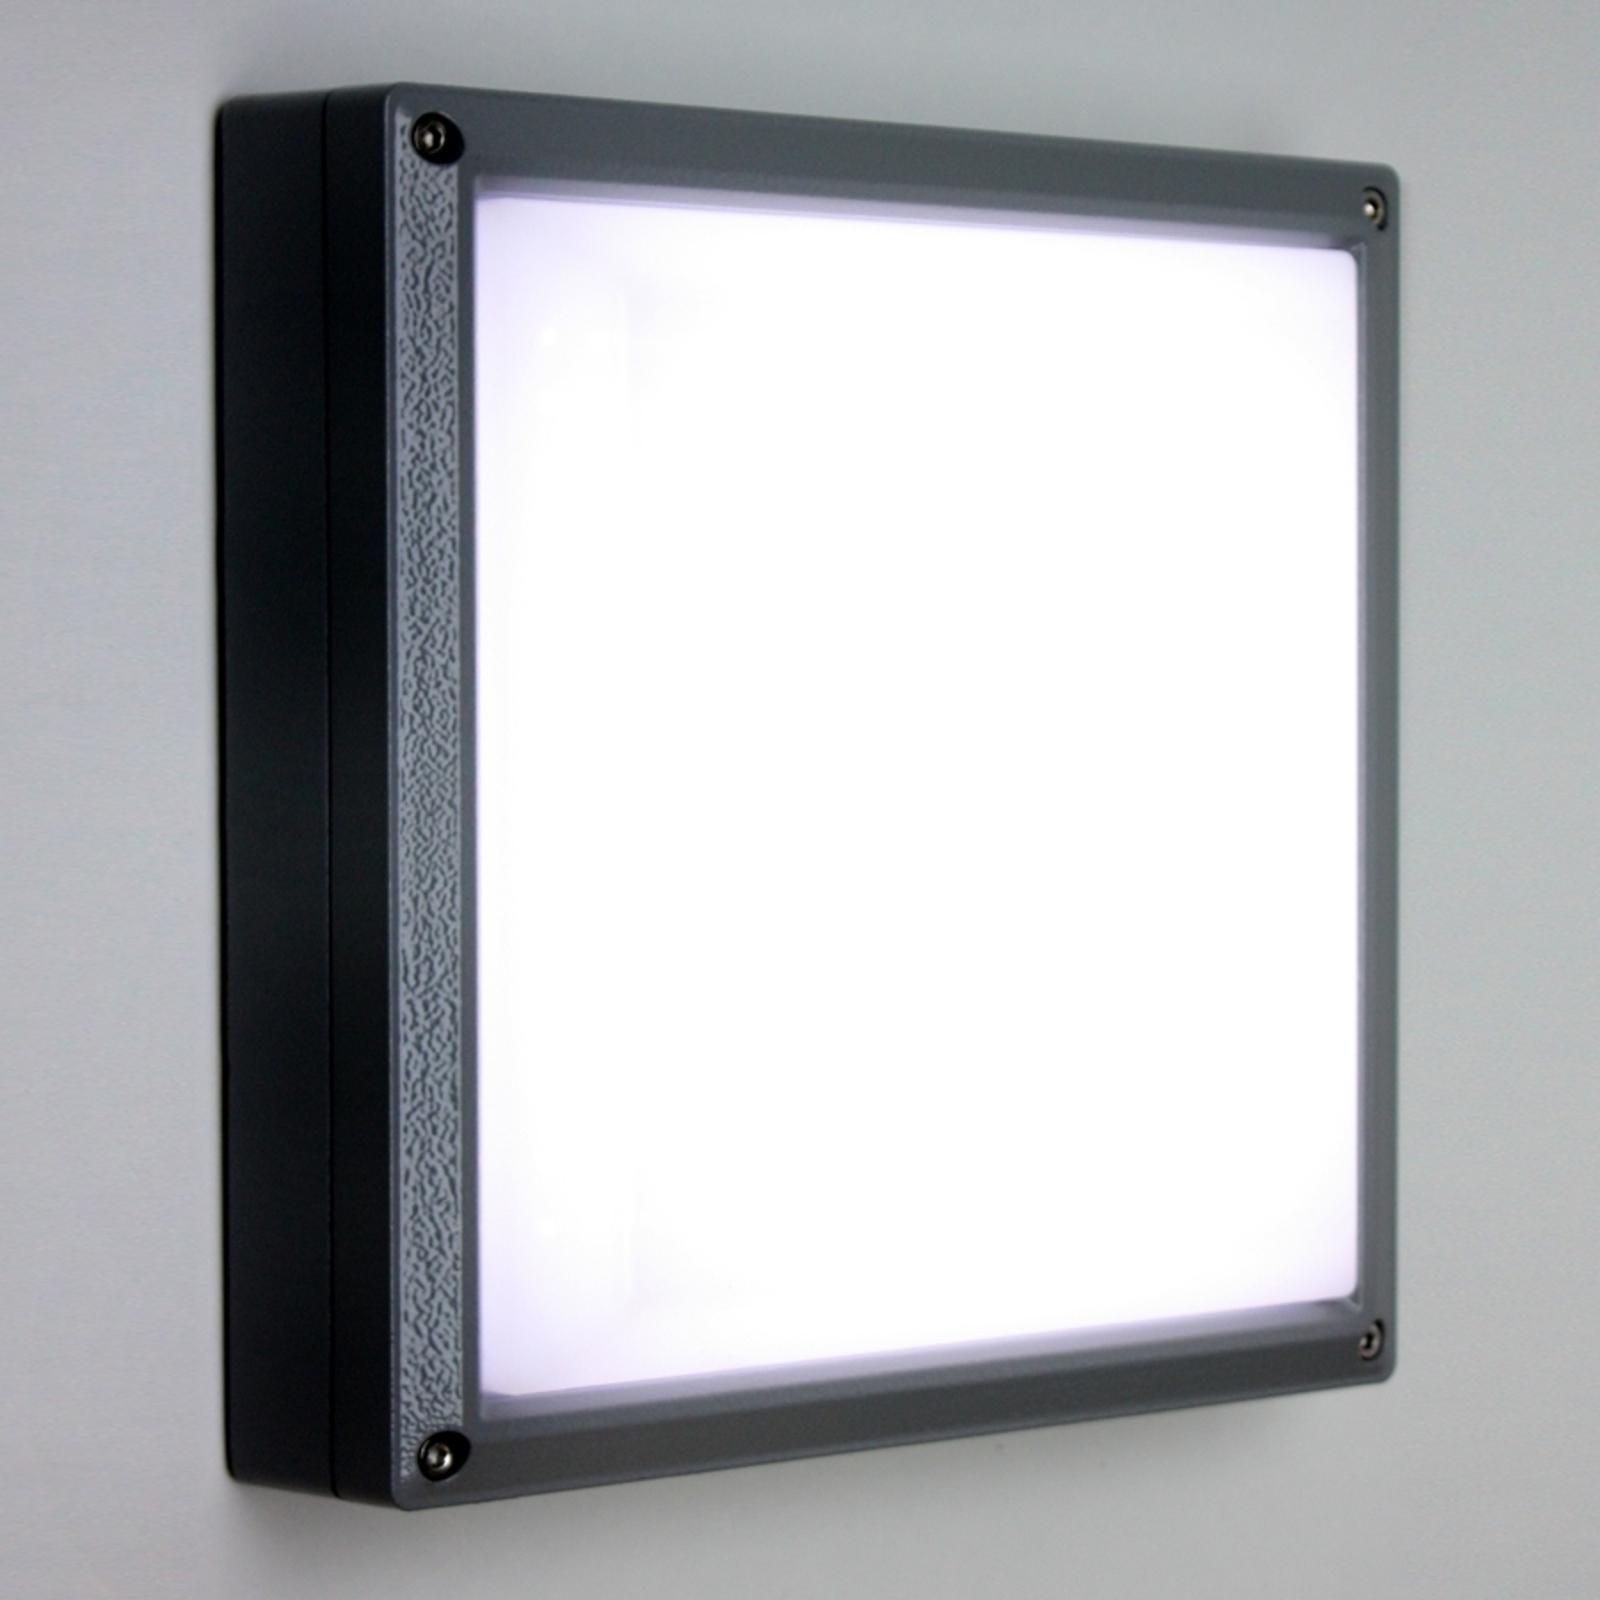 Applique SUN 11 LED 13W anthracite 4 k